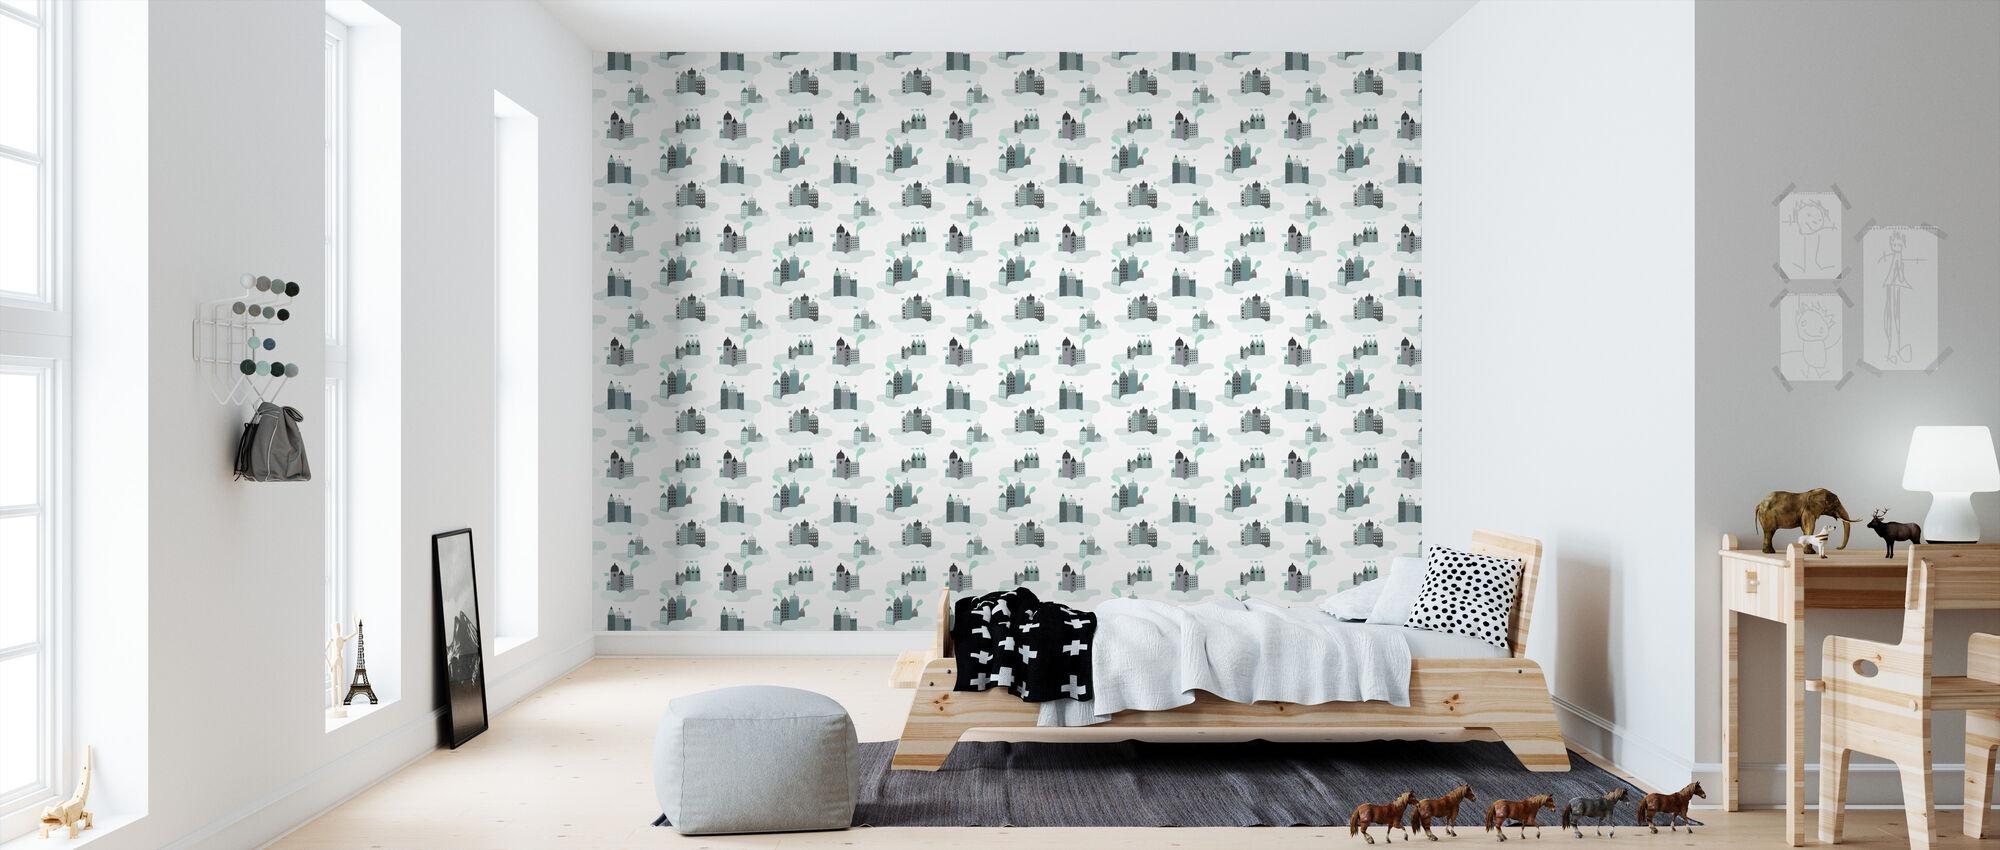 Sky City - Wallpaper - Kids Room